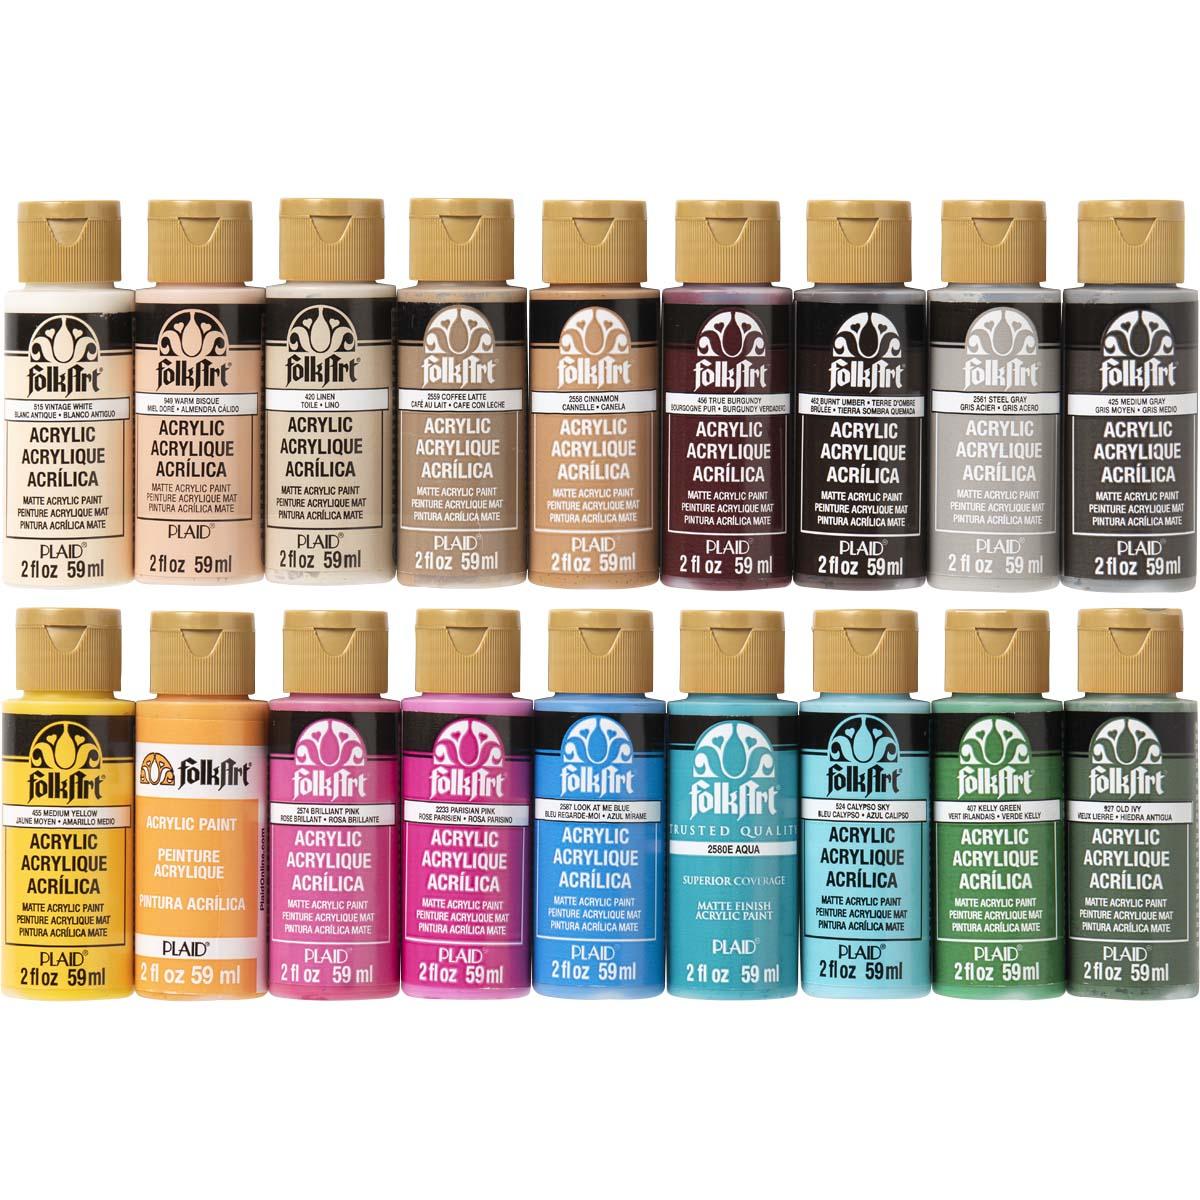 FolkArt ® Acrylic Colors Best Sellers 18 pc, Set 2